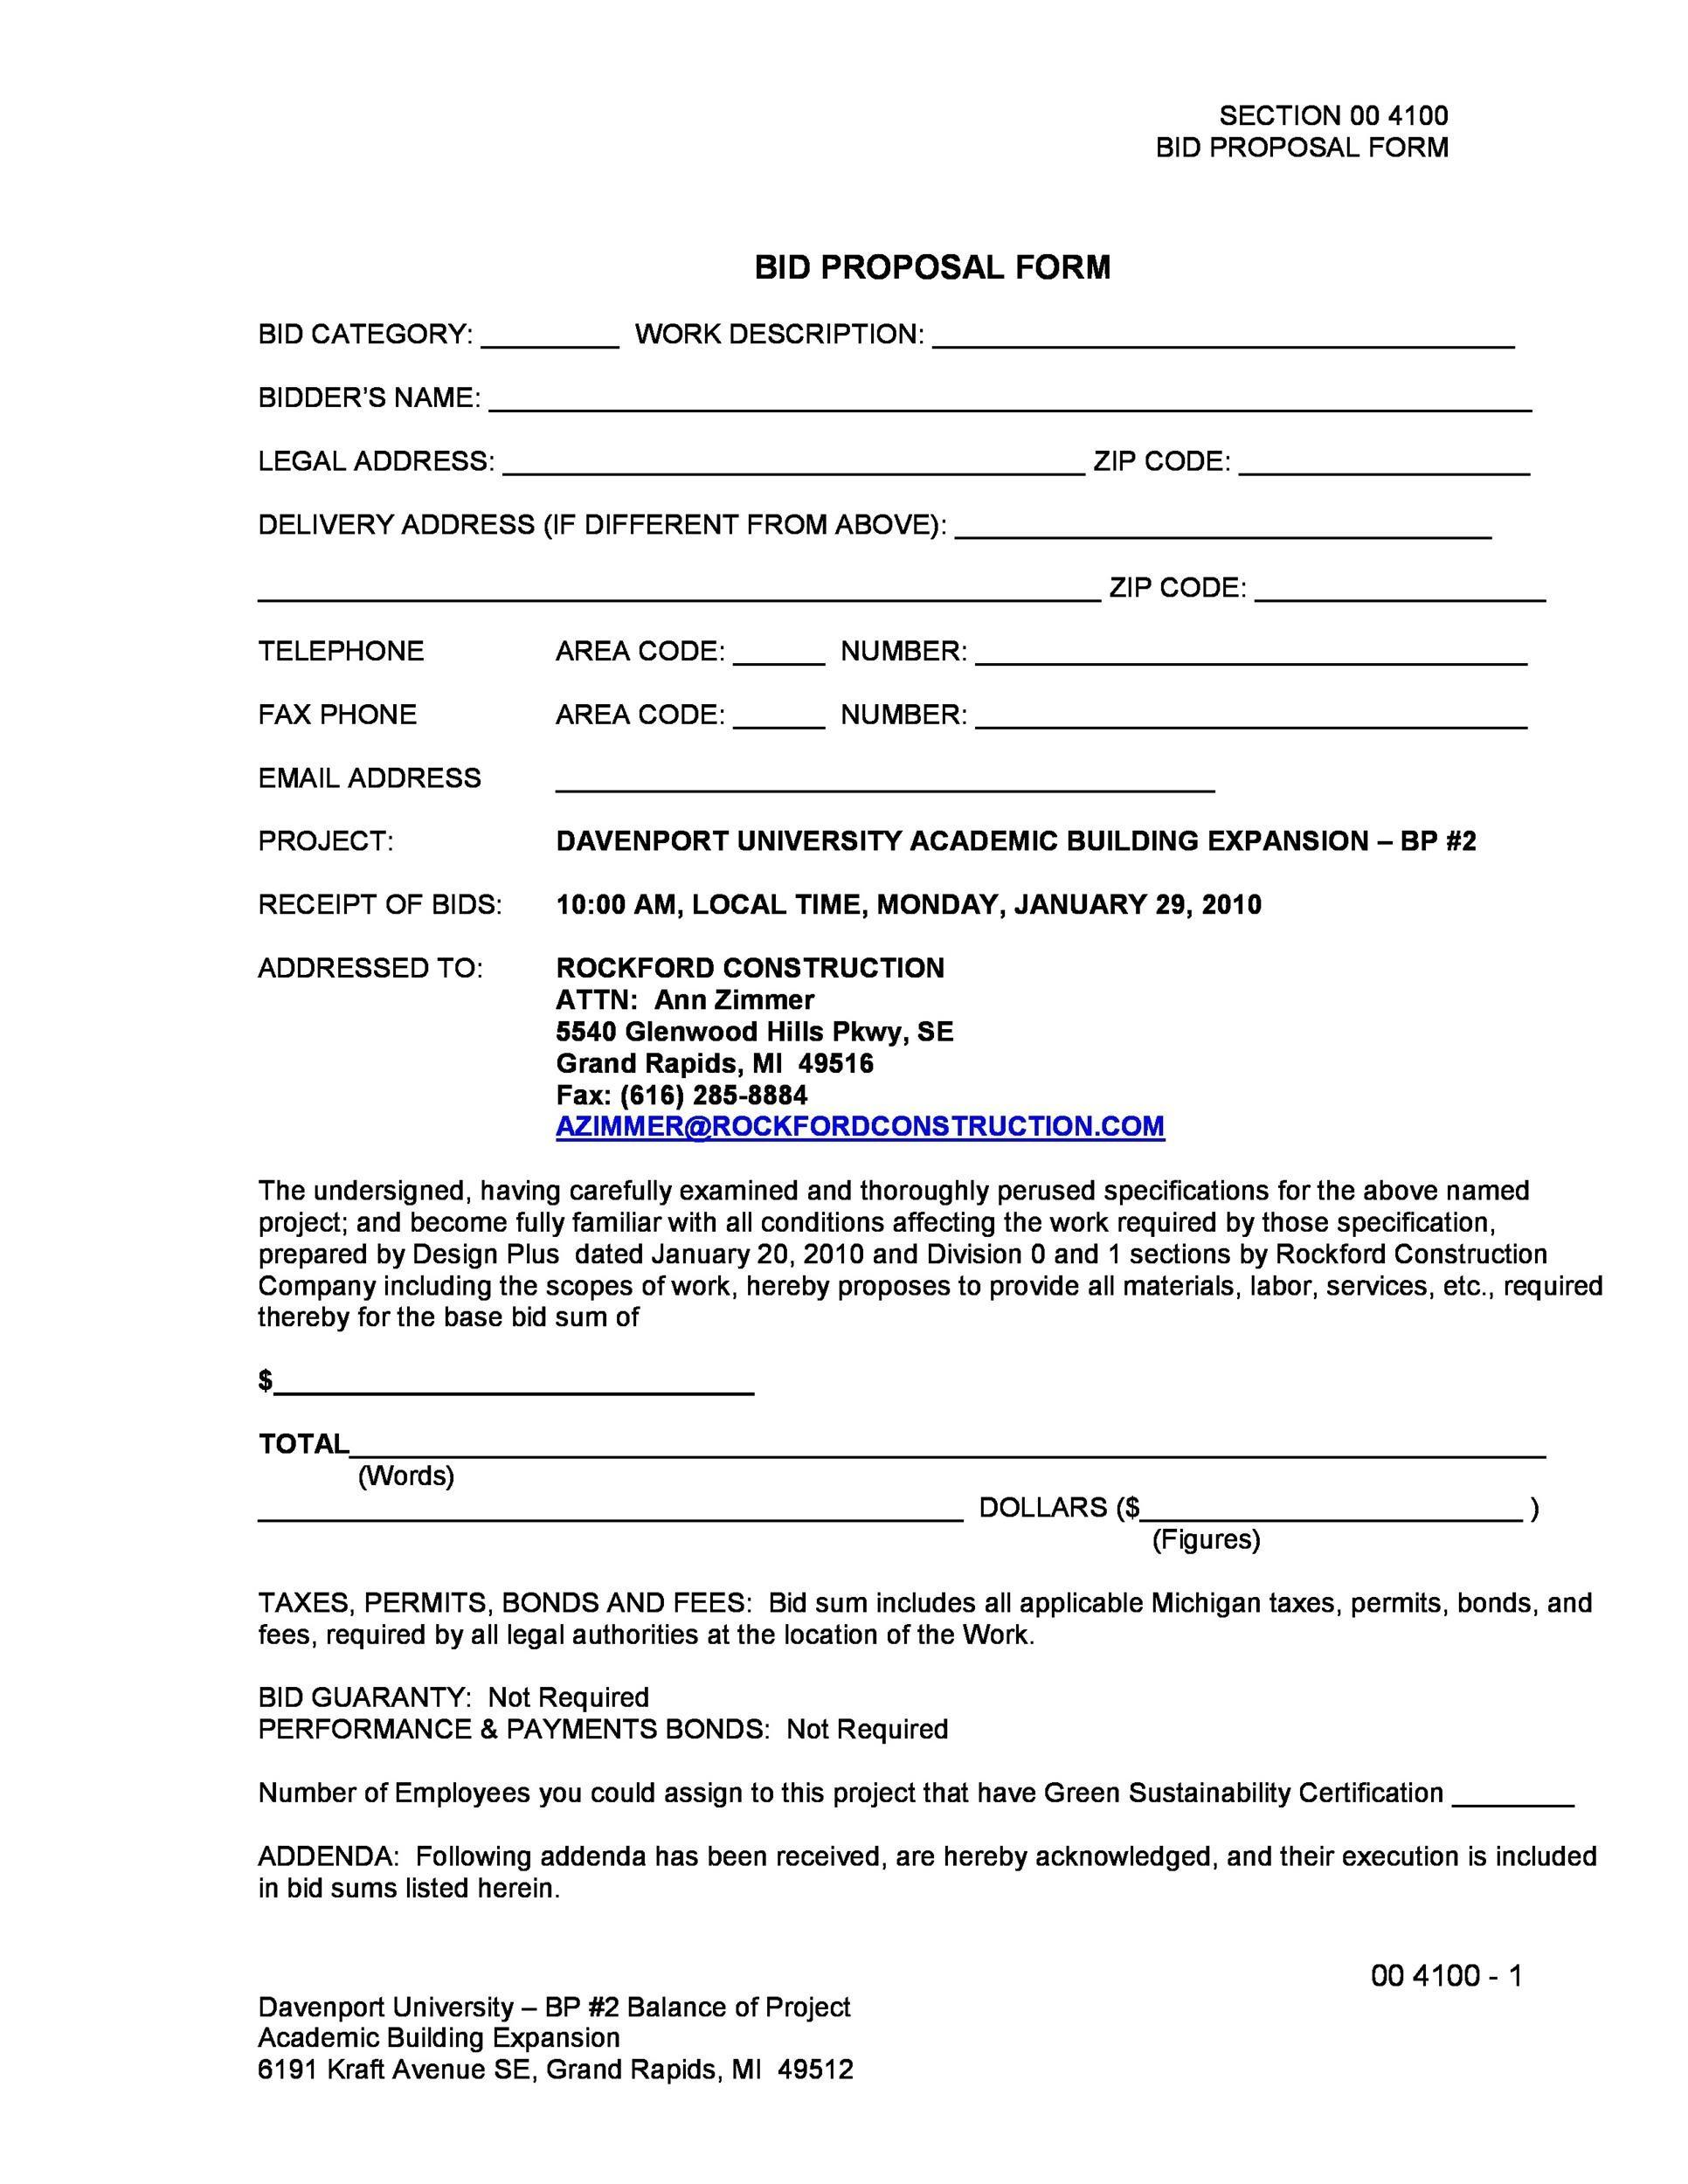 bid form construction - April.onthemarch.co